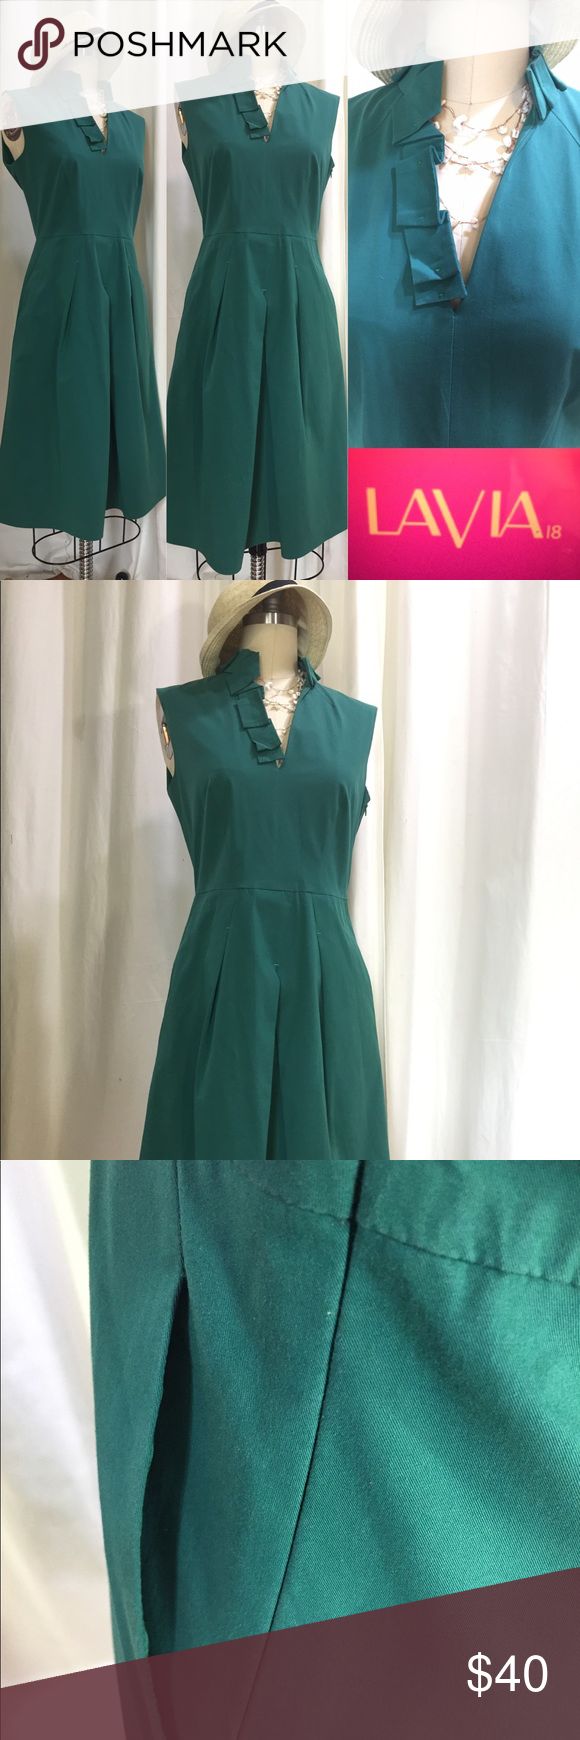 Lavia dress size itus italy fans and alice olivia